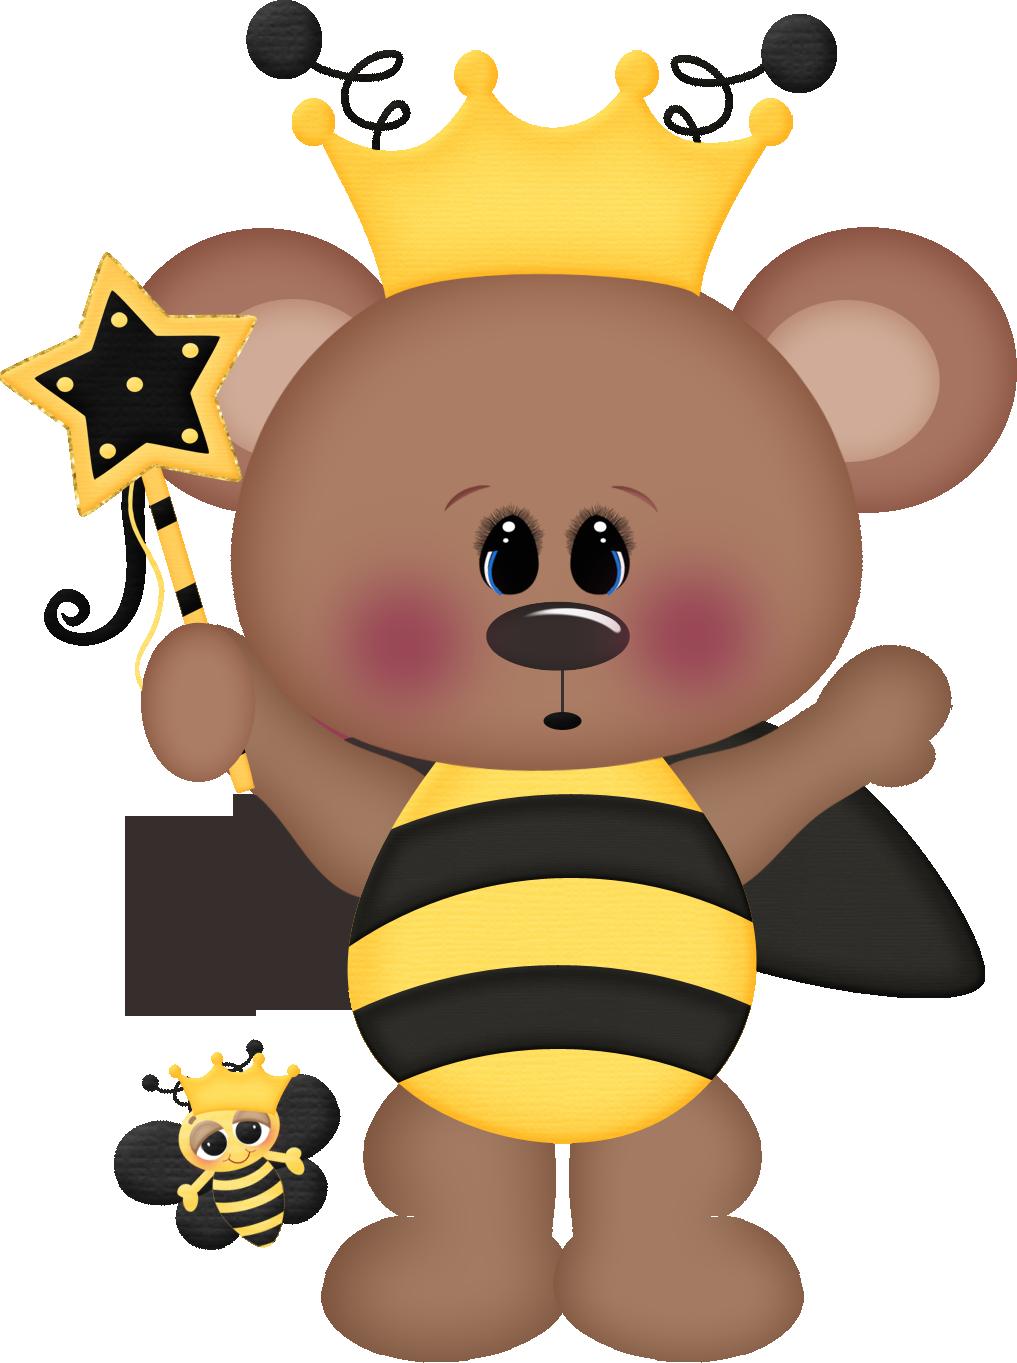 Clipart bee bear. Photo by daniellemoraesfalcao minus